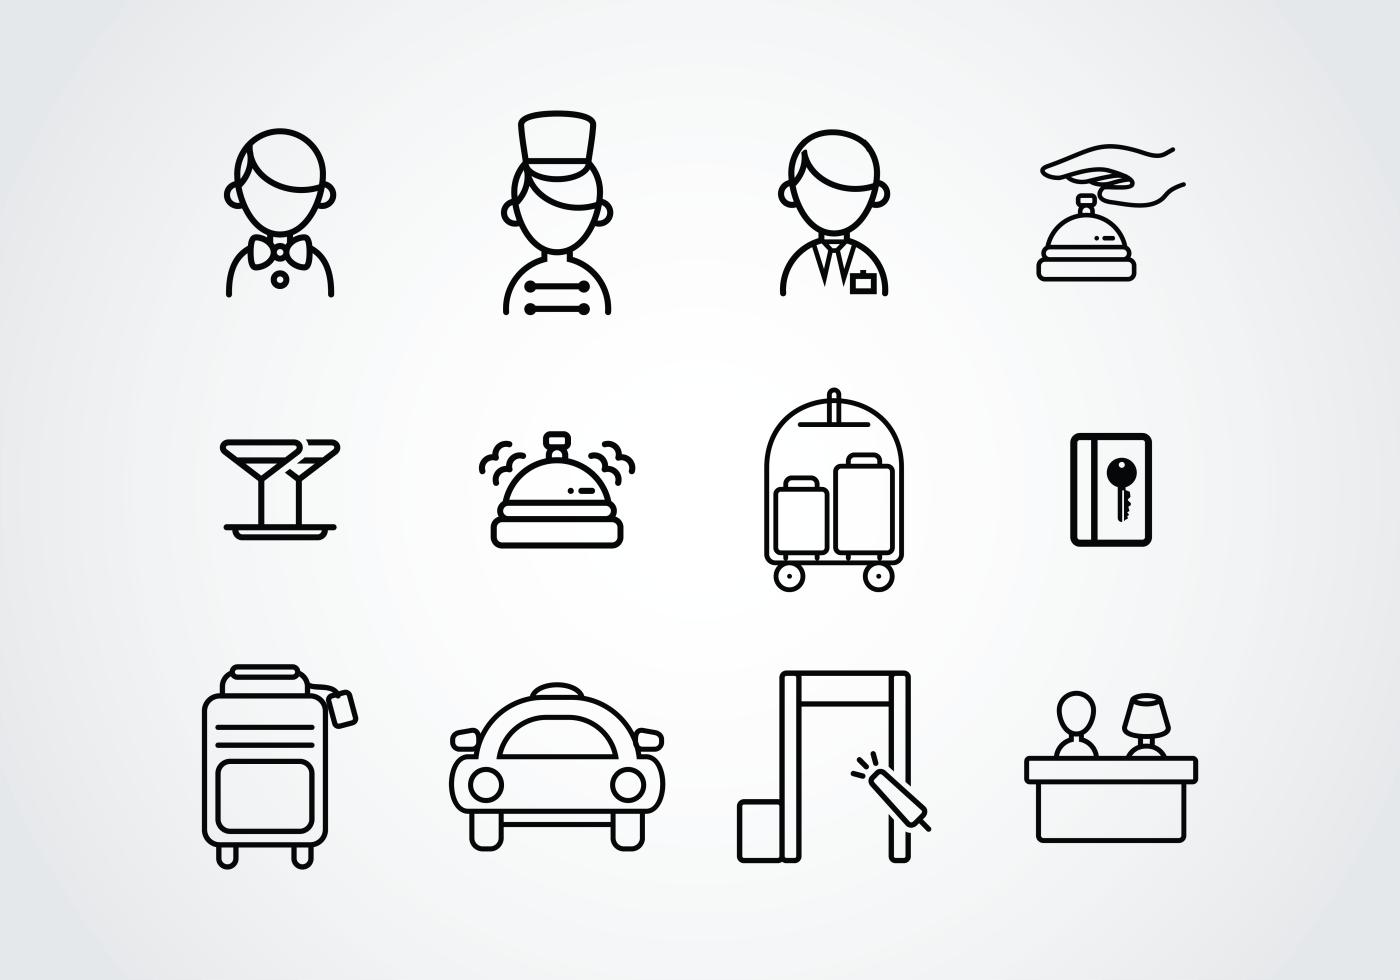 Concierge Pictogram Icons Download Free Vector Art